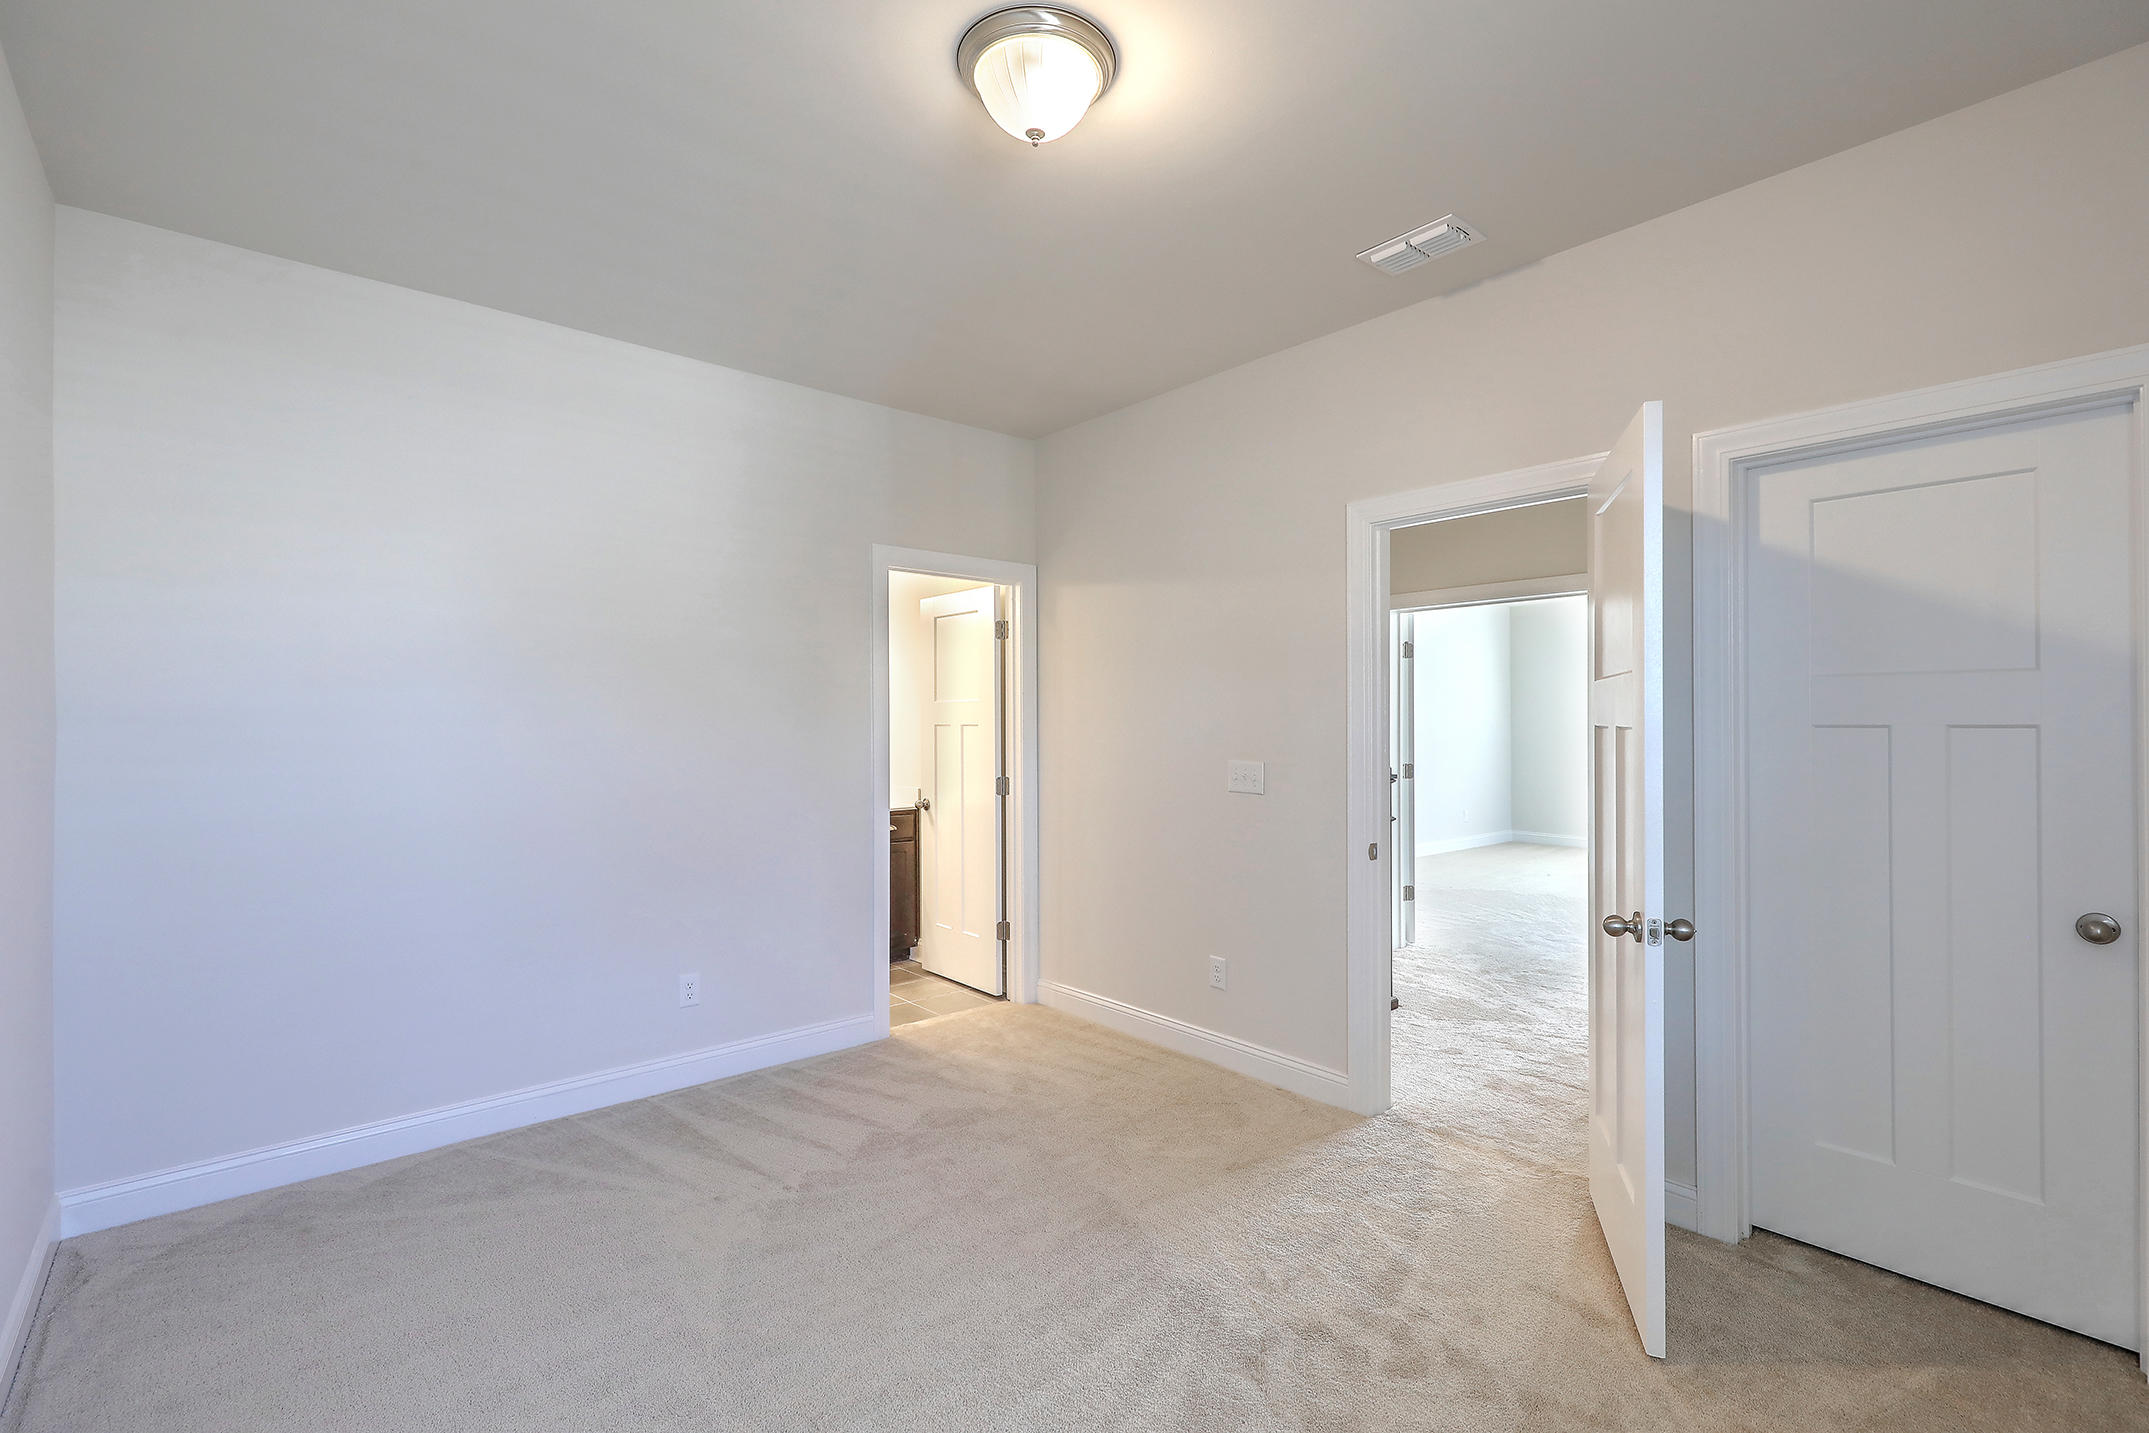 Bentley Park Homes For Sale - 1281 Gannett, Mount Pleasant, SC - 22